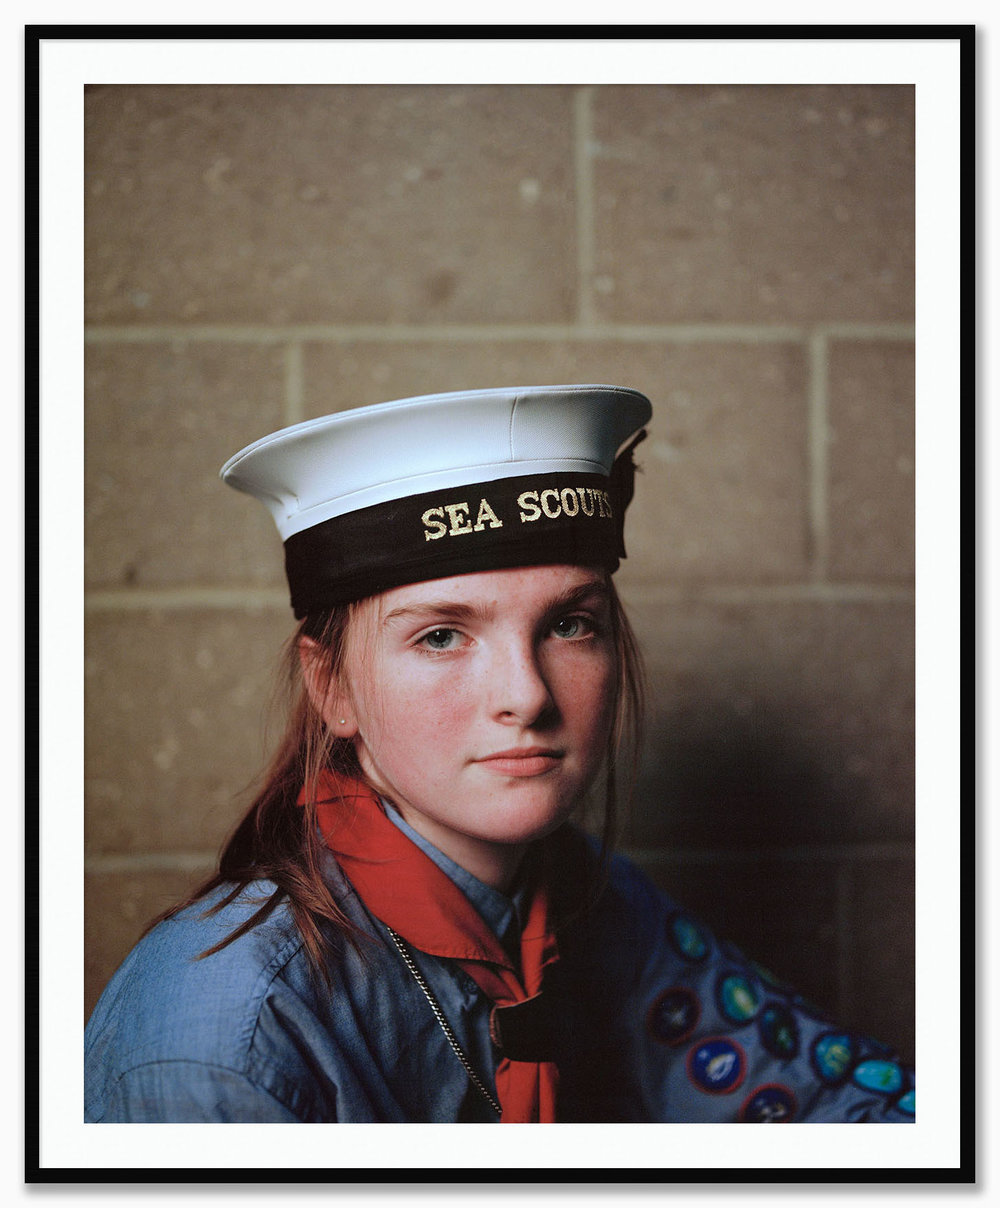 Untitled IV. Sea Scout. England. Izzy de Wattripont_Mat_MatteBlack.jpg